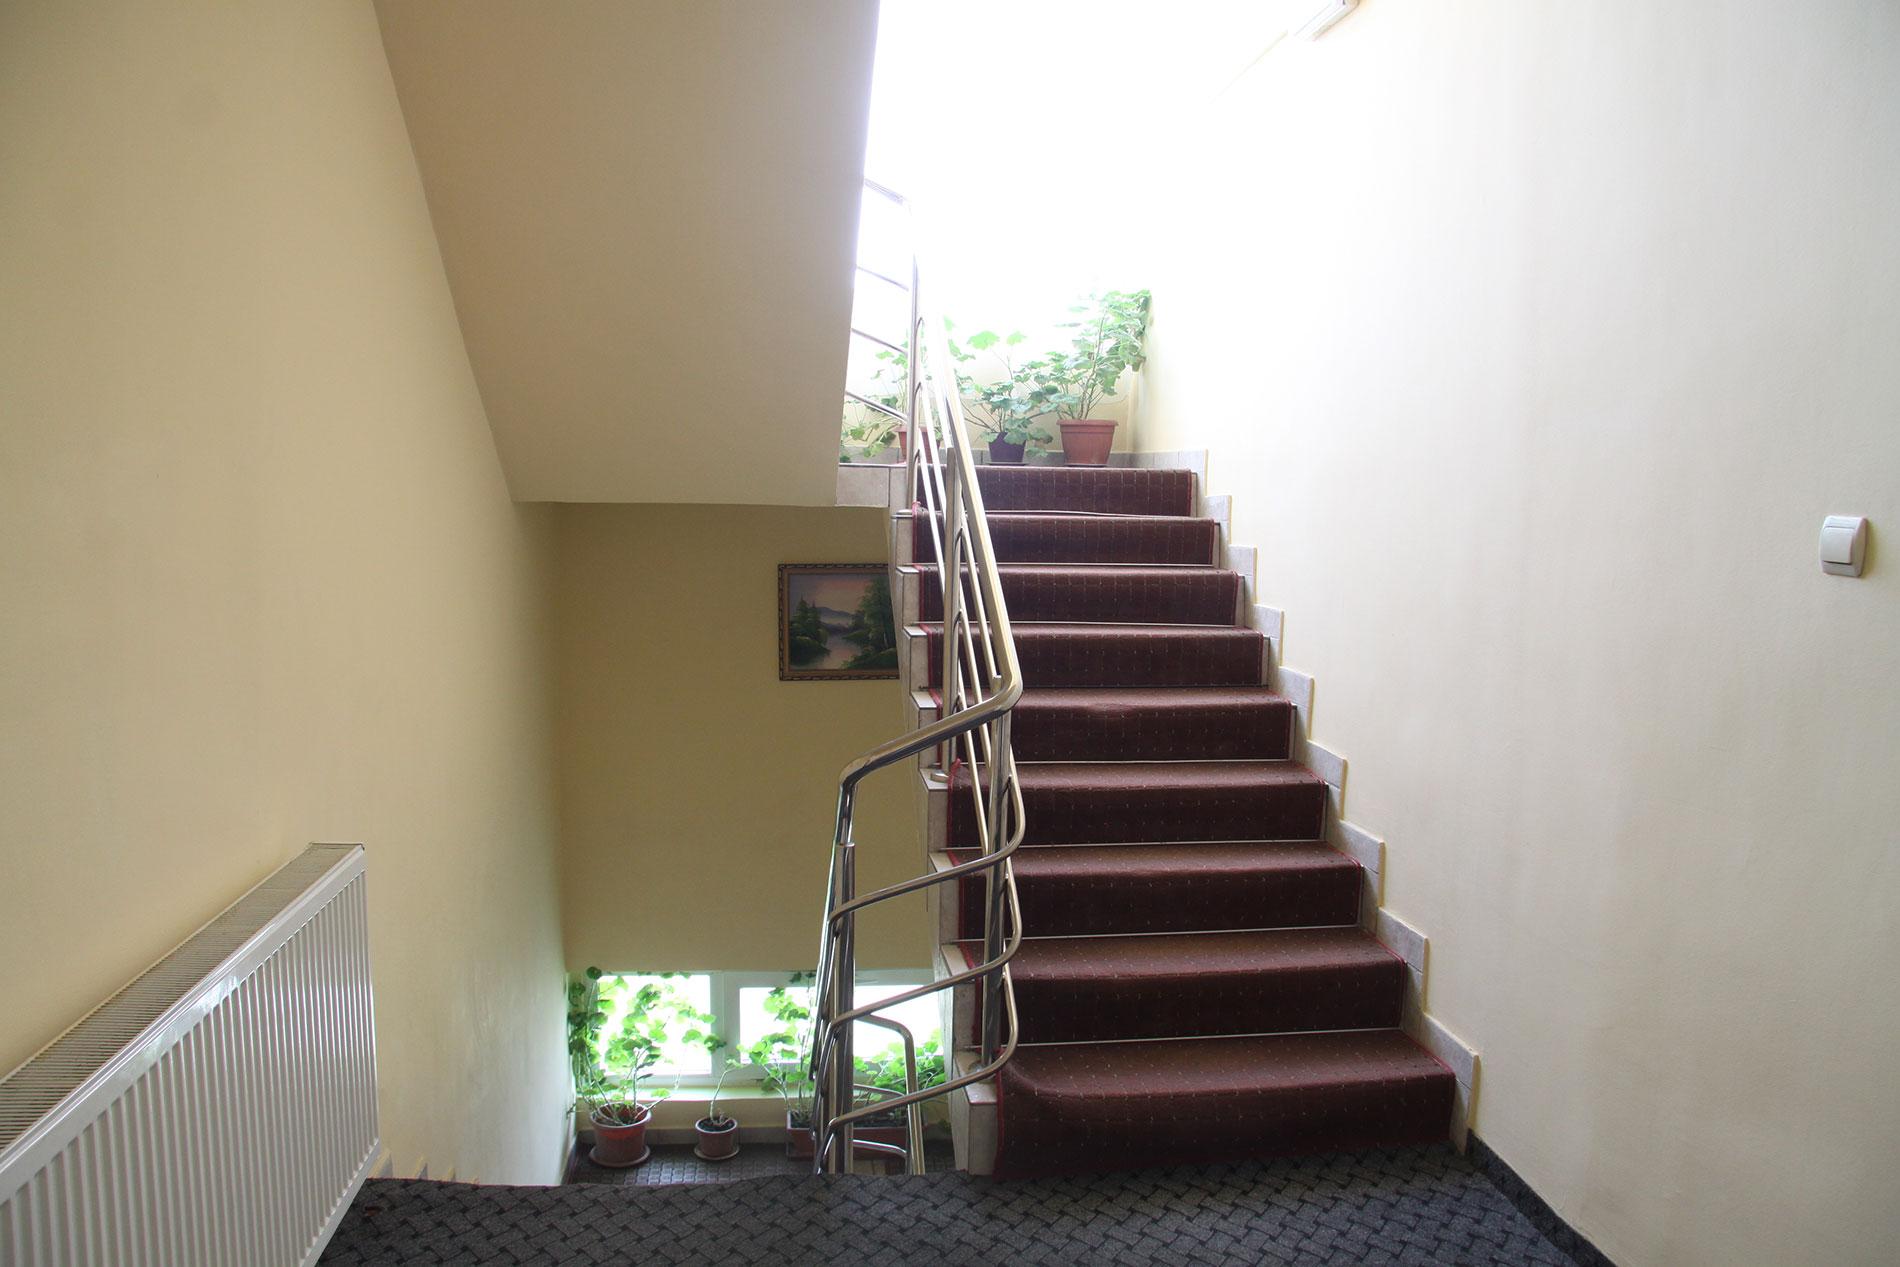 scara-interioara-hotel-corola-oradea-cazare-oradea-2